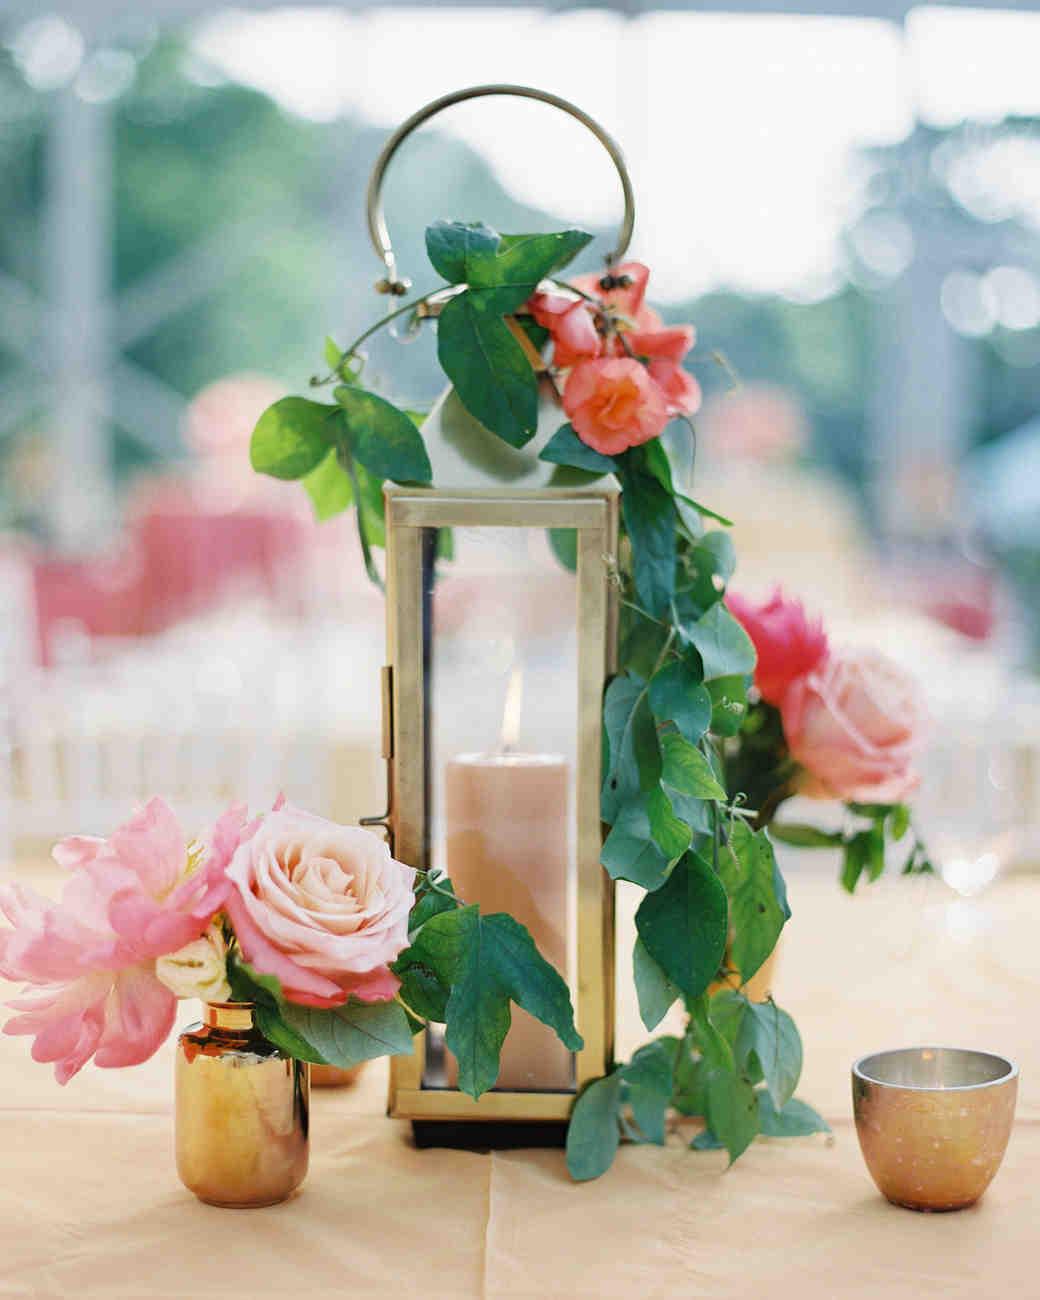 easy wedding centerpieces blogs workanyware co uk u2022 rh blogs workanyware co uk